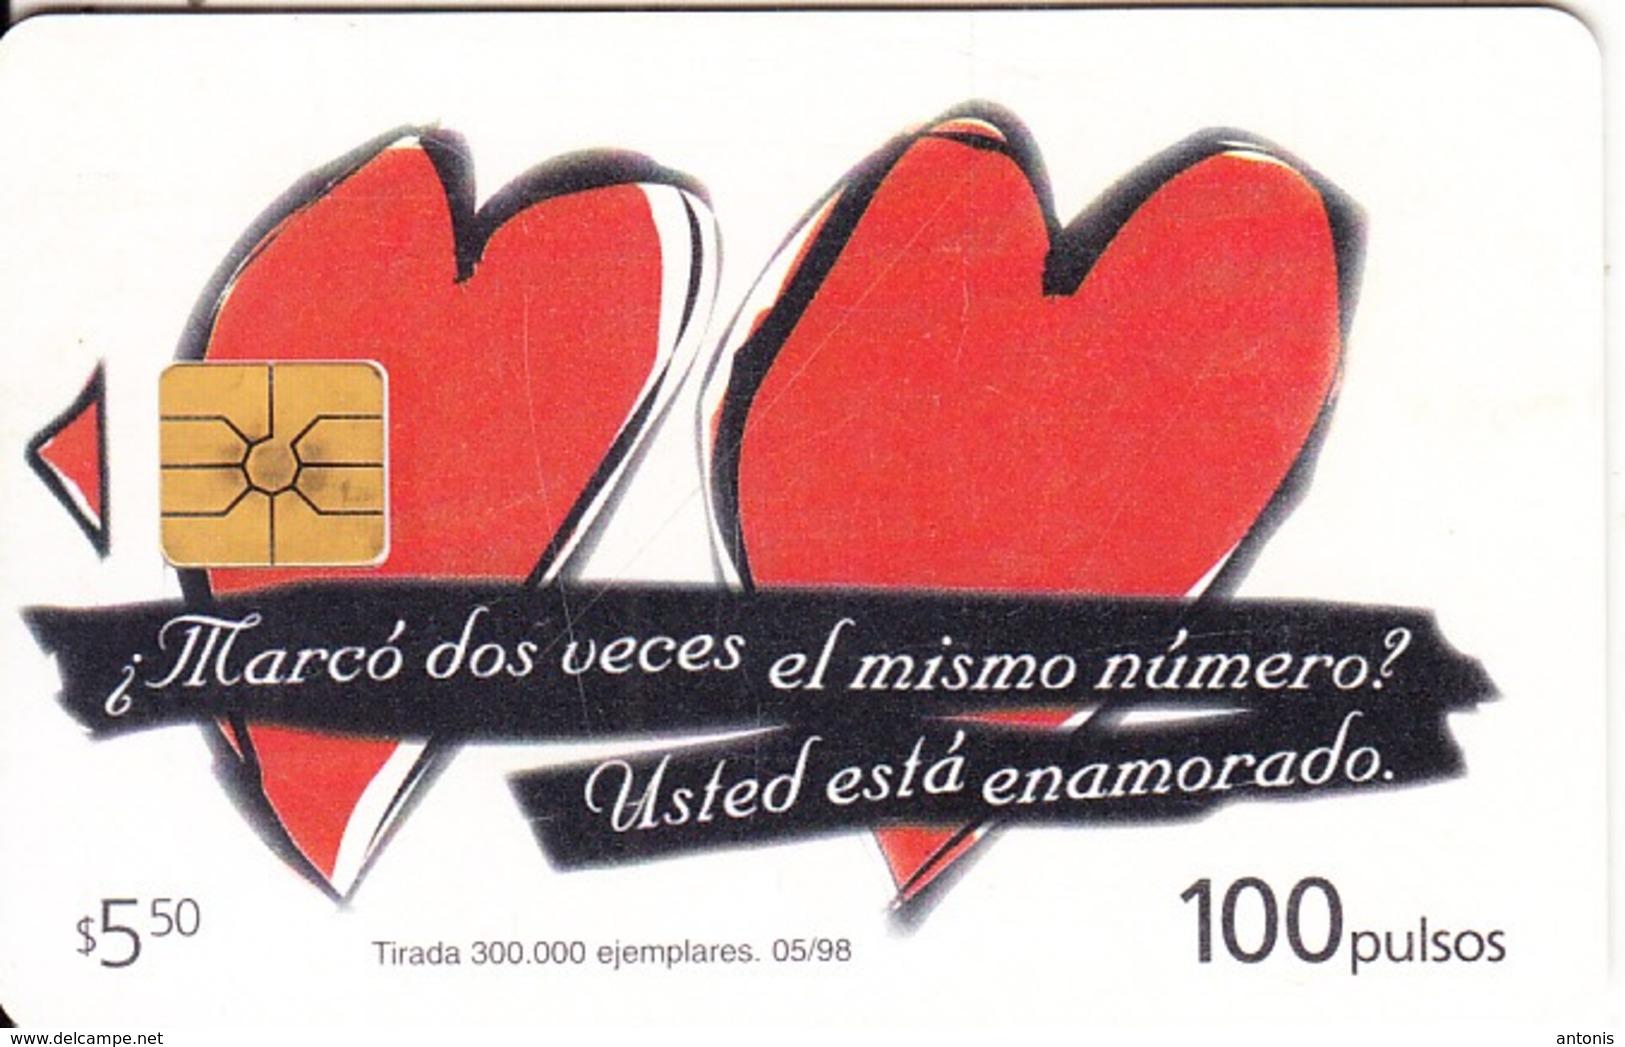 ARGENTINA - Hearts, Telecom Argentina Telecard, Chip GEM1, 05/98, Used - Argentinien